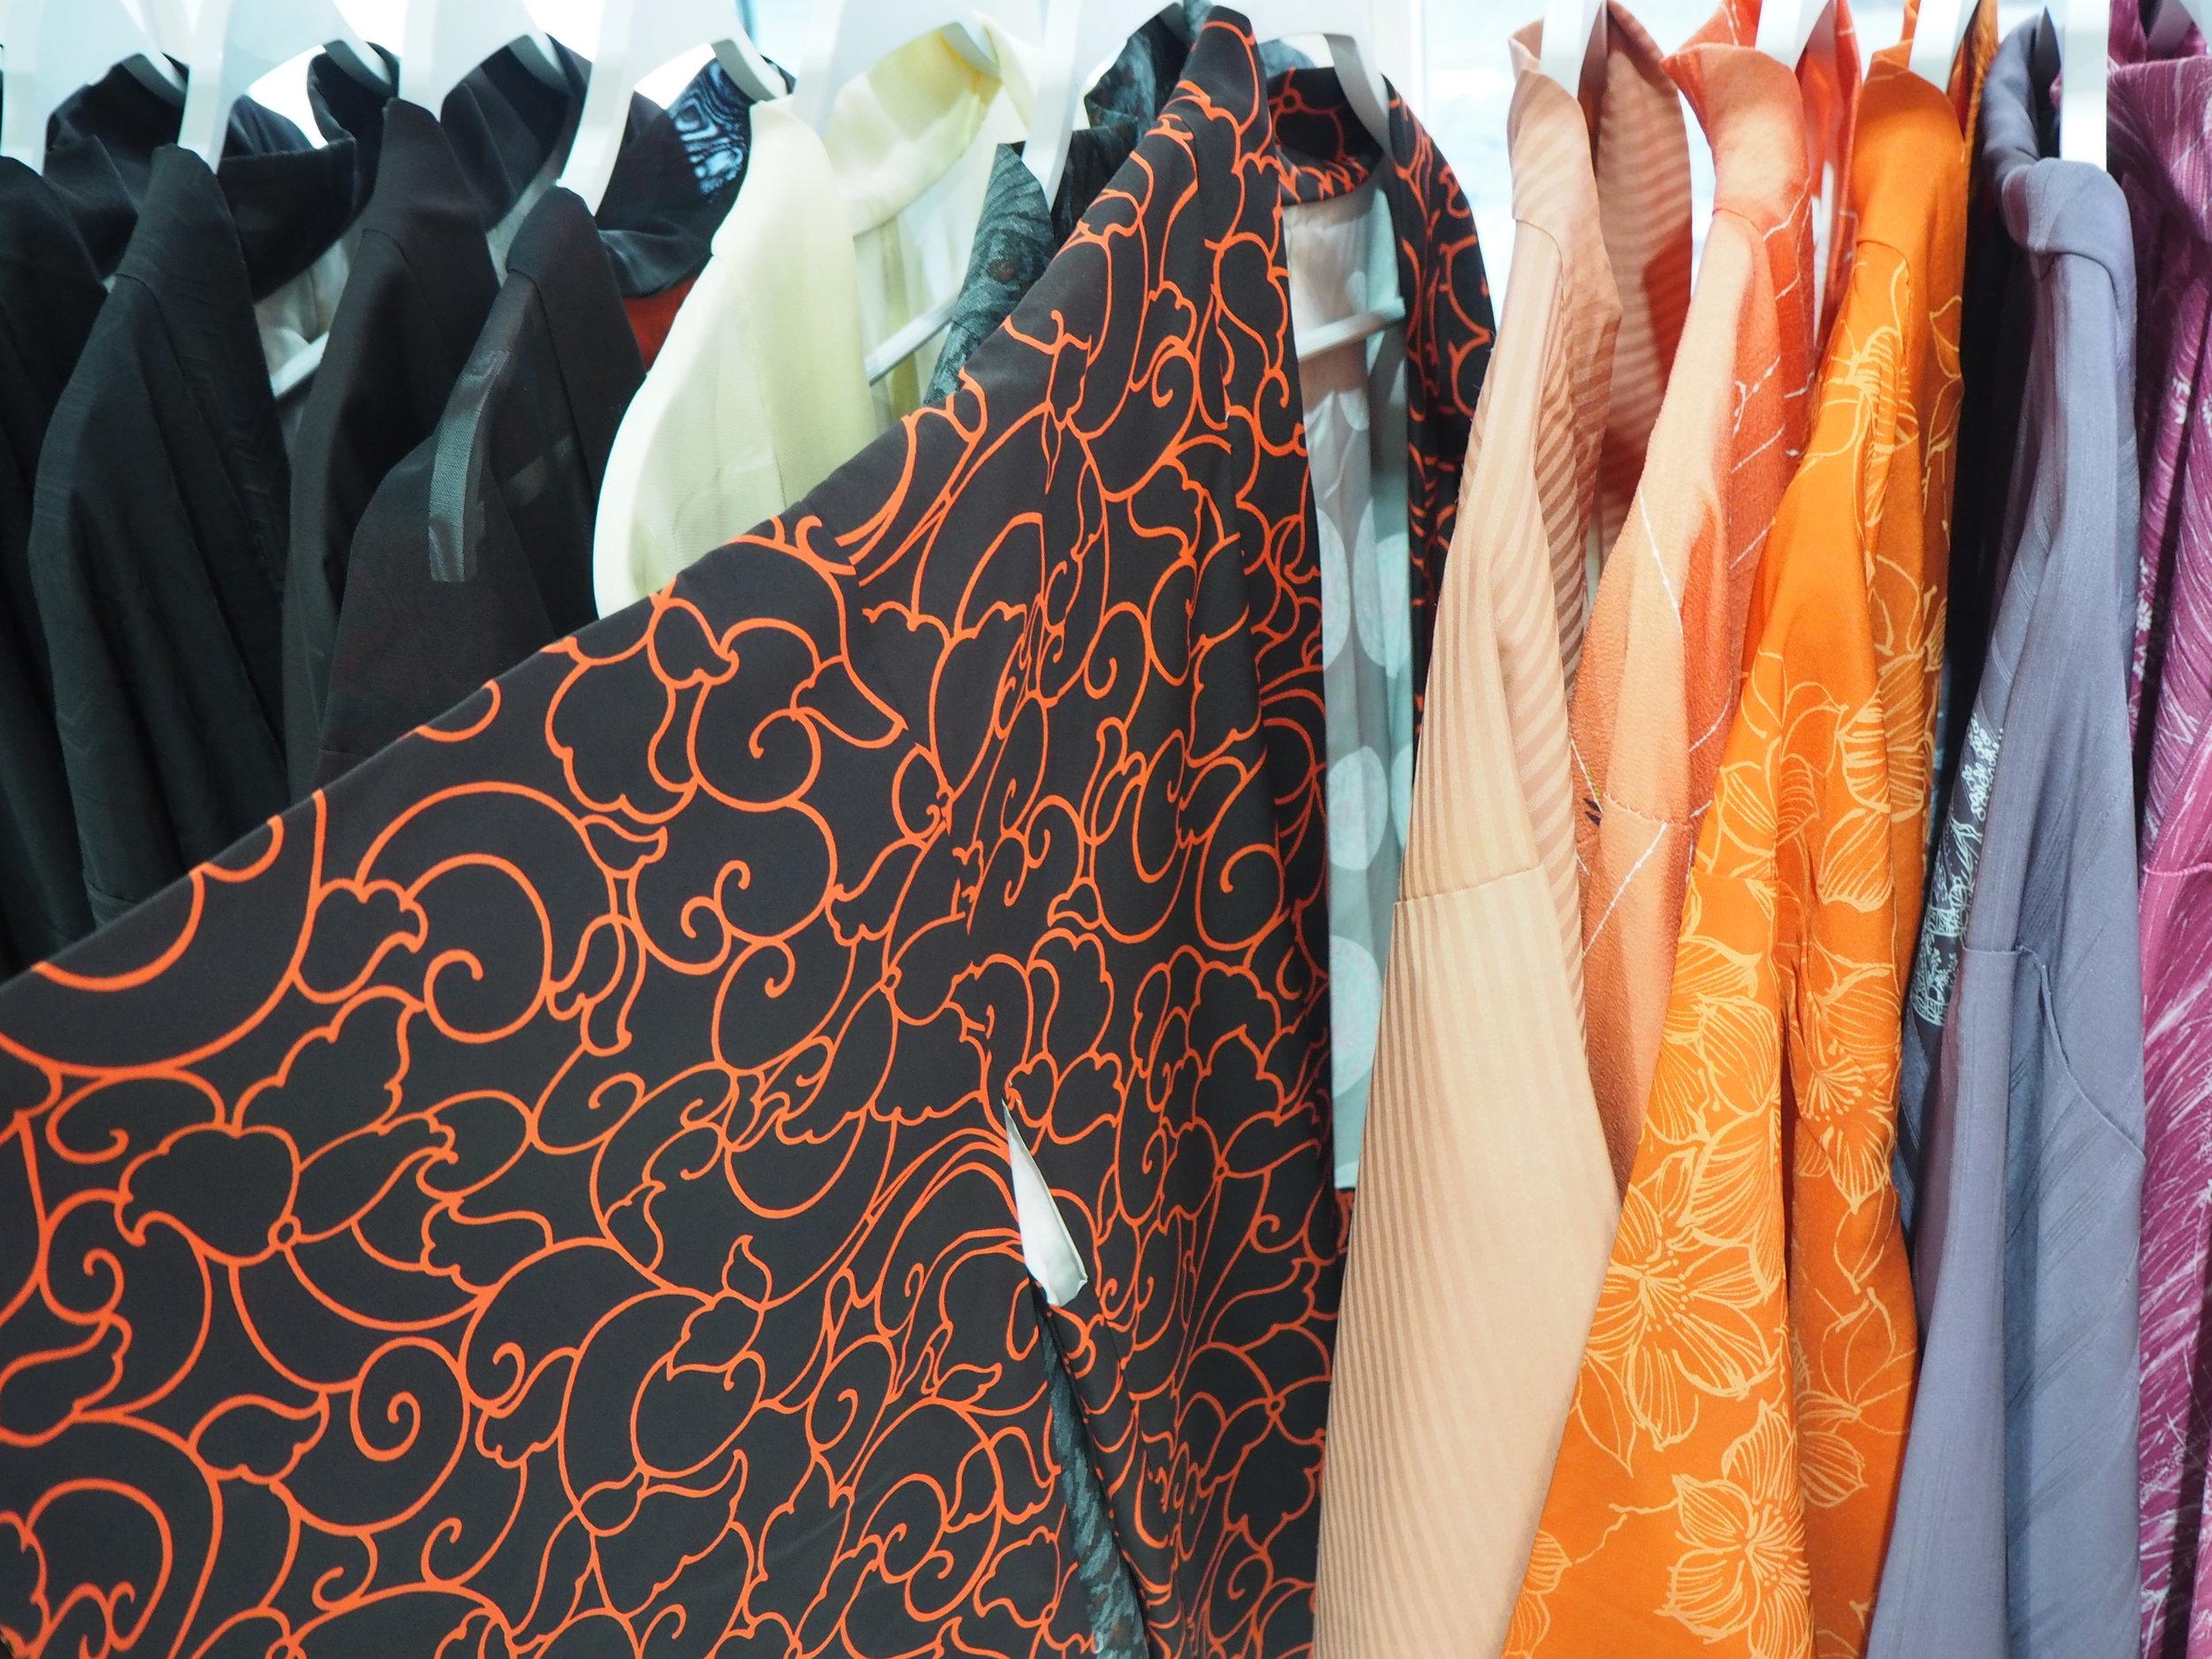 tiendas-ropa-madrid-originales-kimonos-cortos.JPG